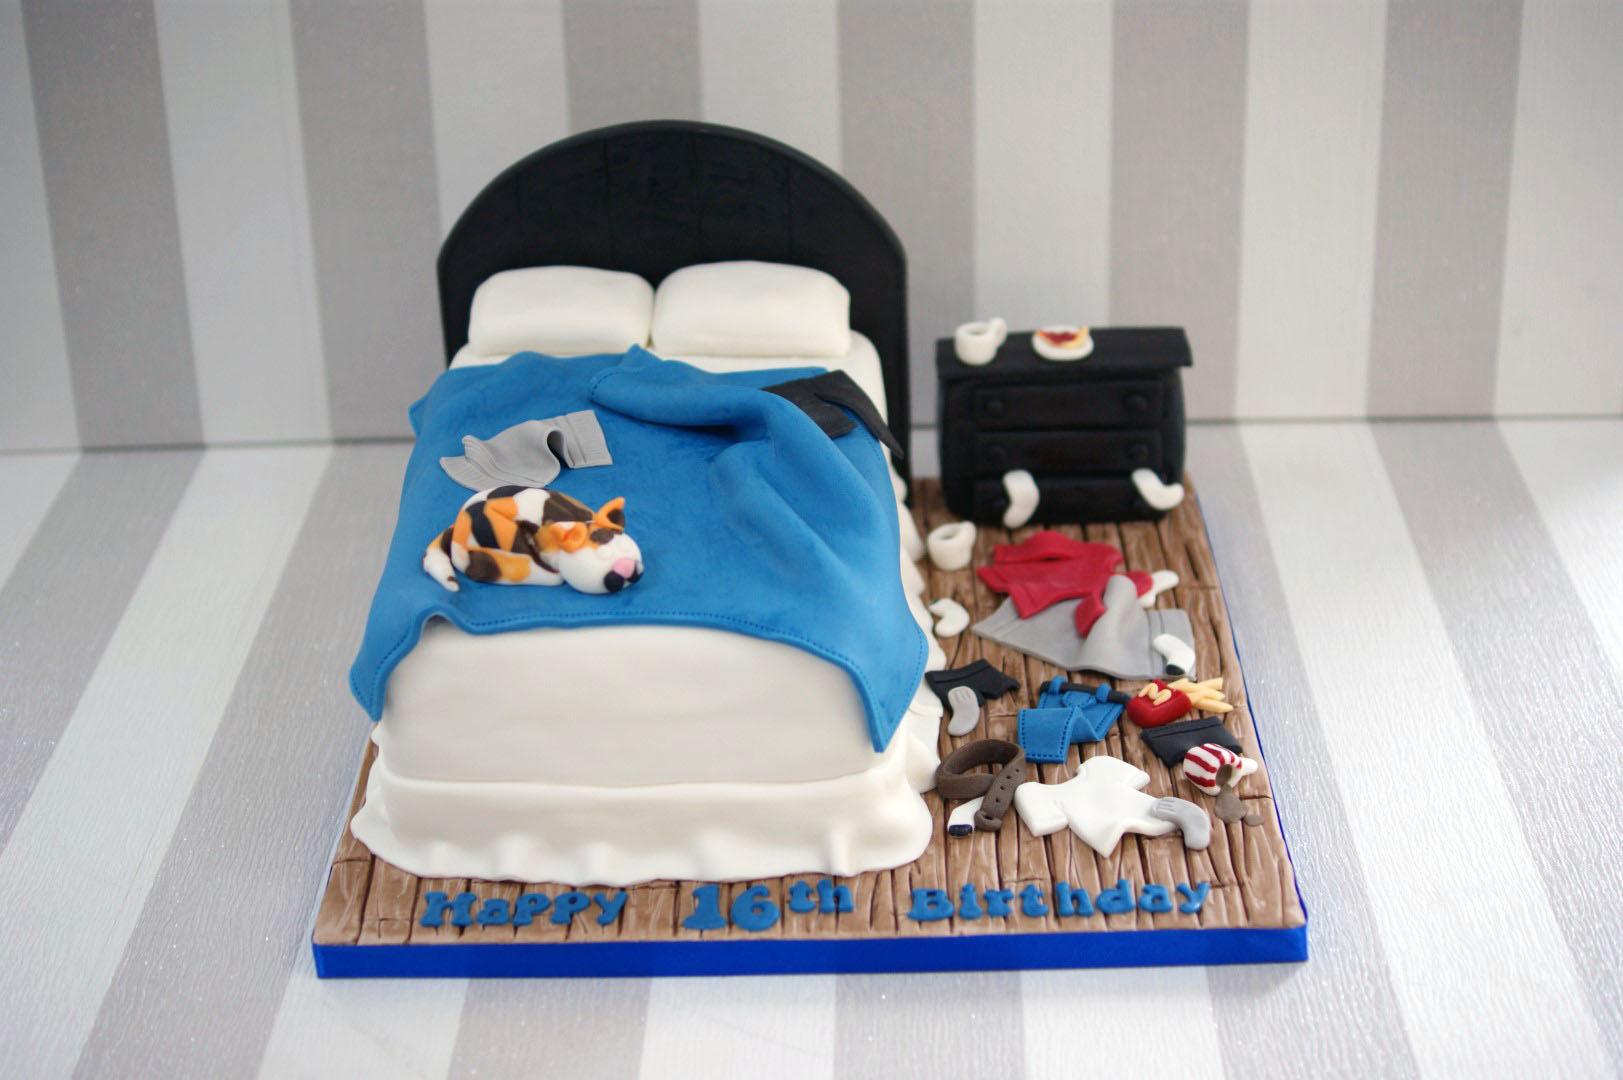 Bedroom Decor For Baby Boy